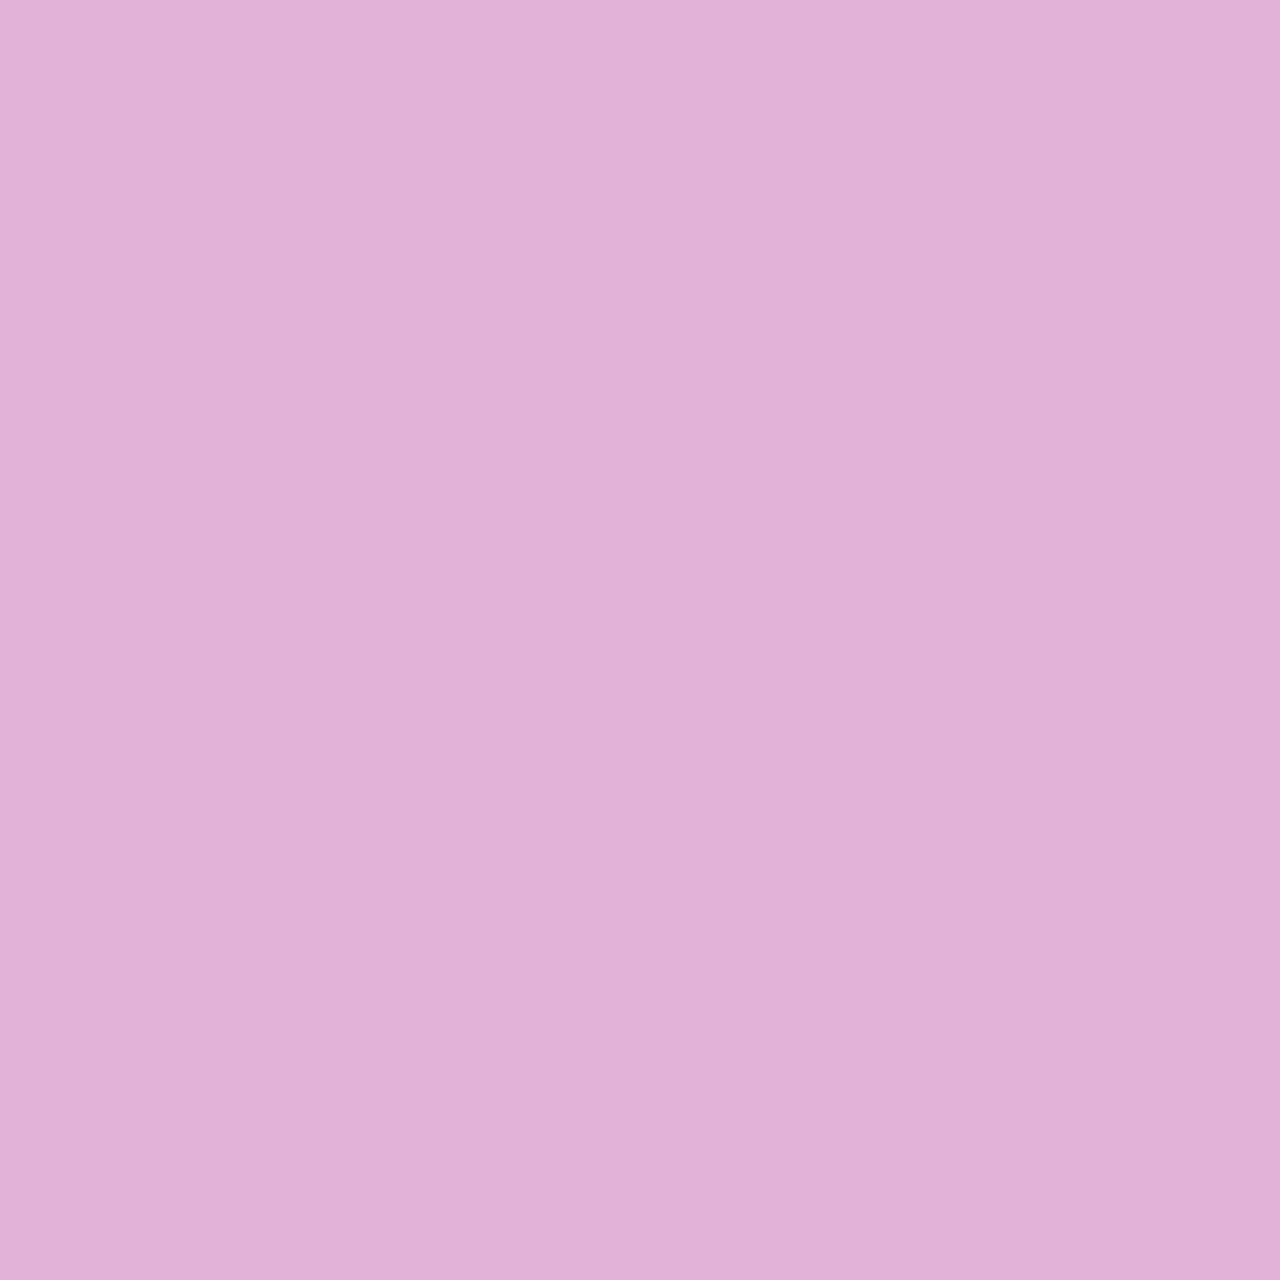 "#3309 Rosco Gels Roscolux 3/4 Minusgreen, 20x24"""